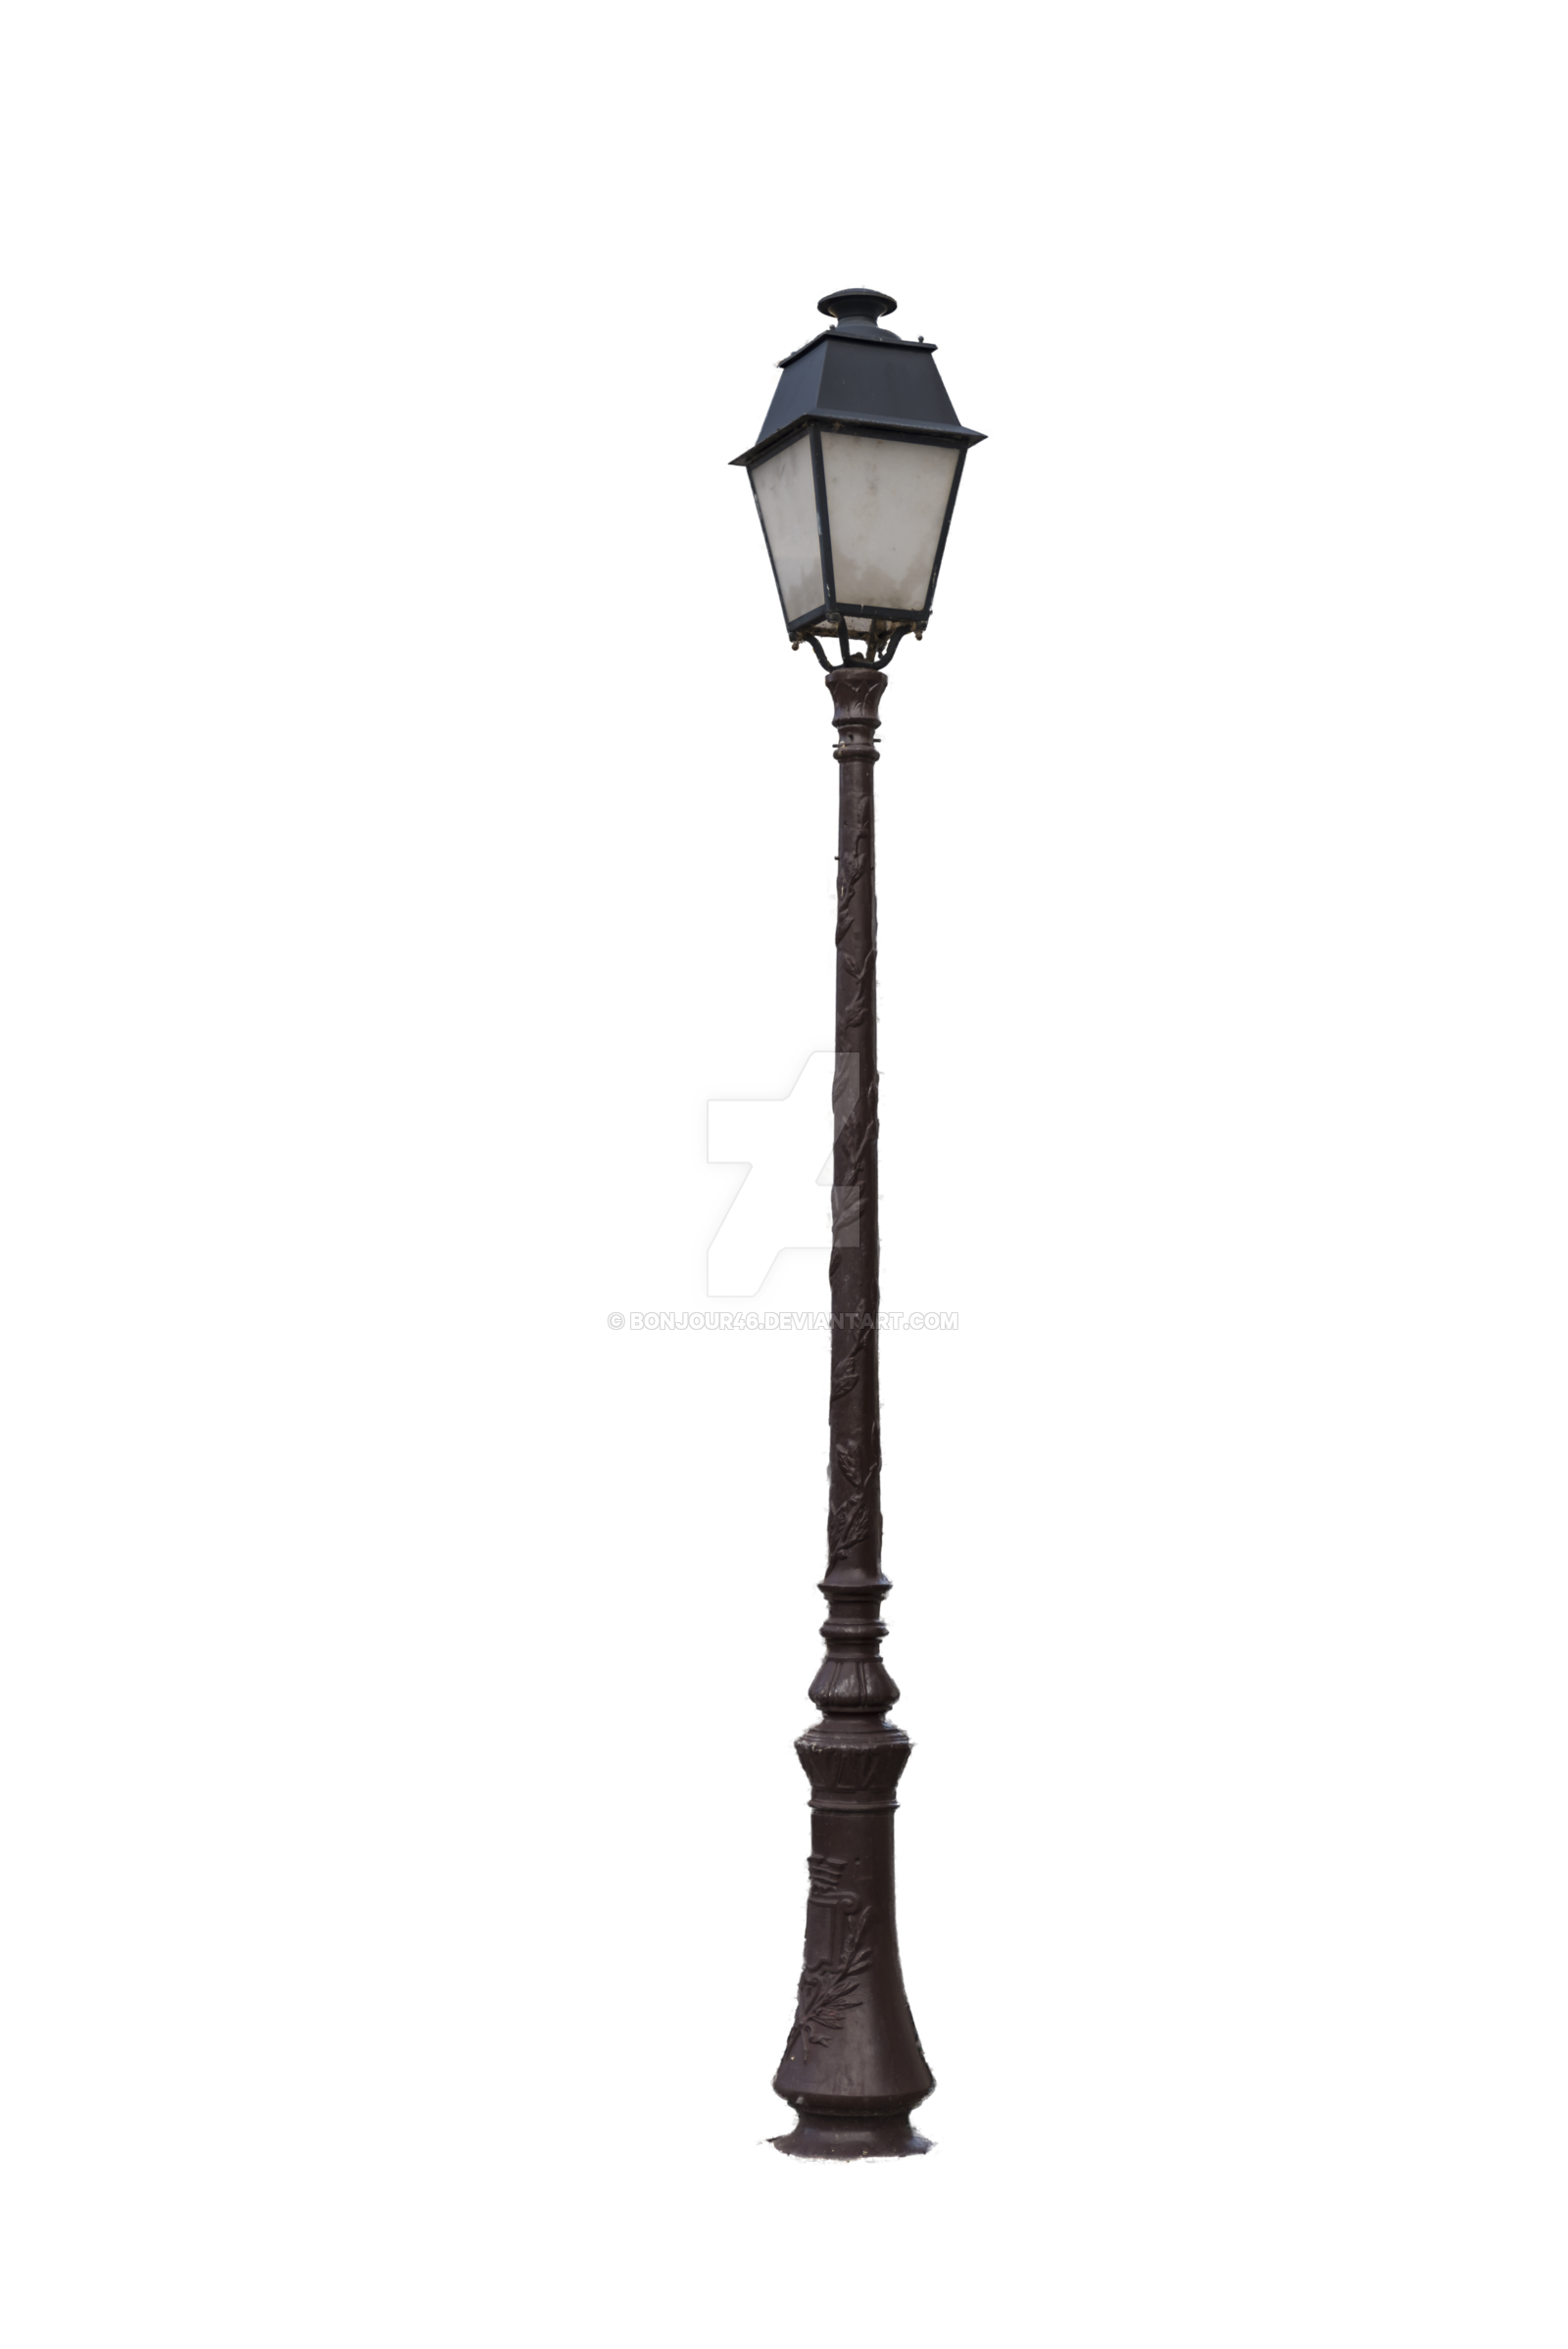 Paris clipart lamp post, Paris lamp post Transparent FREE.